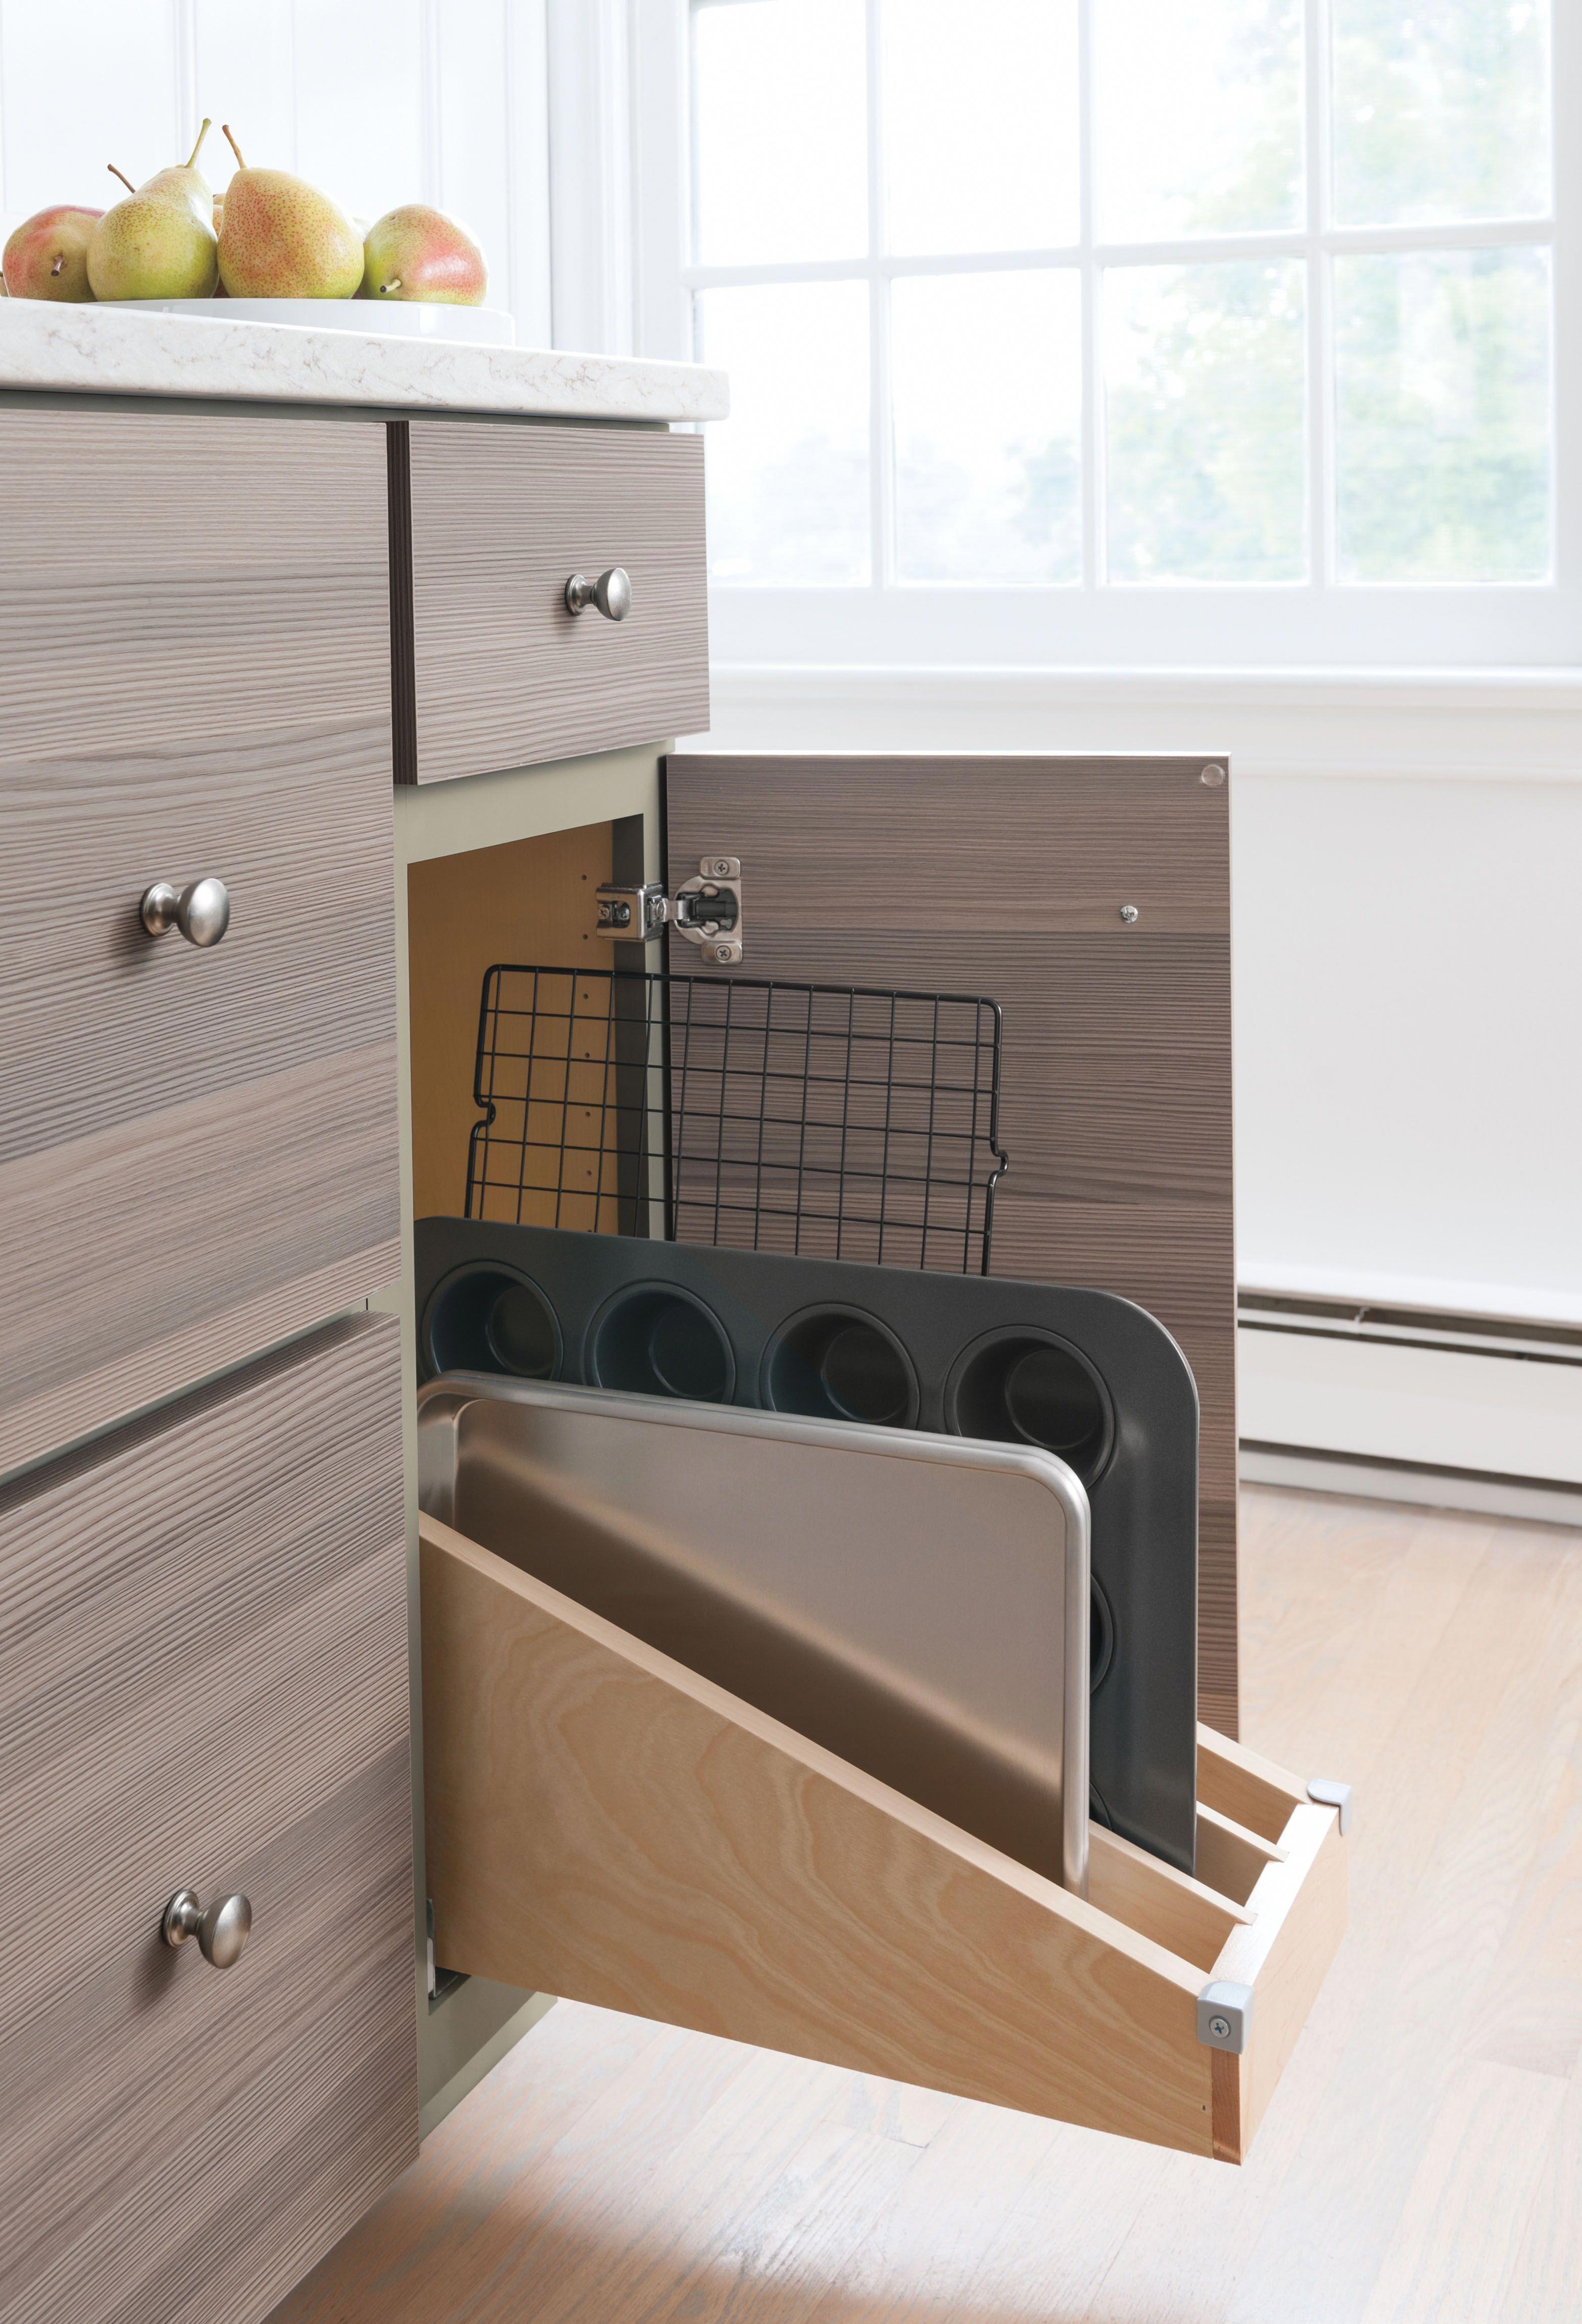 10x10 Kitchen Remodel: #kitchenbar 10x10 Kitchen Remodel Cost